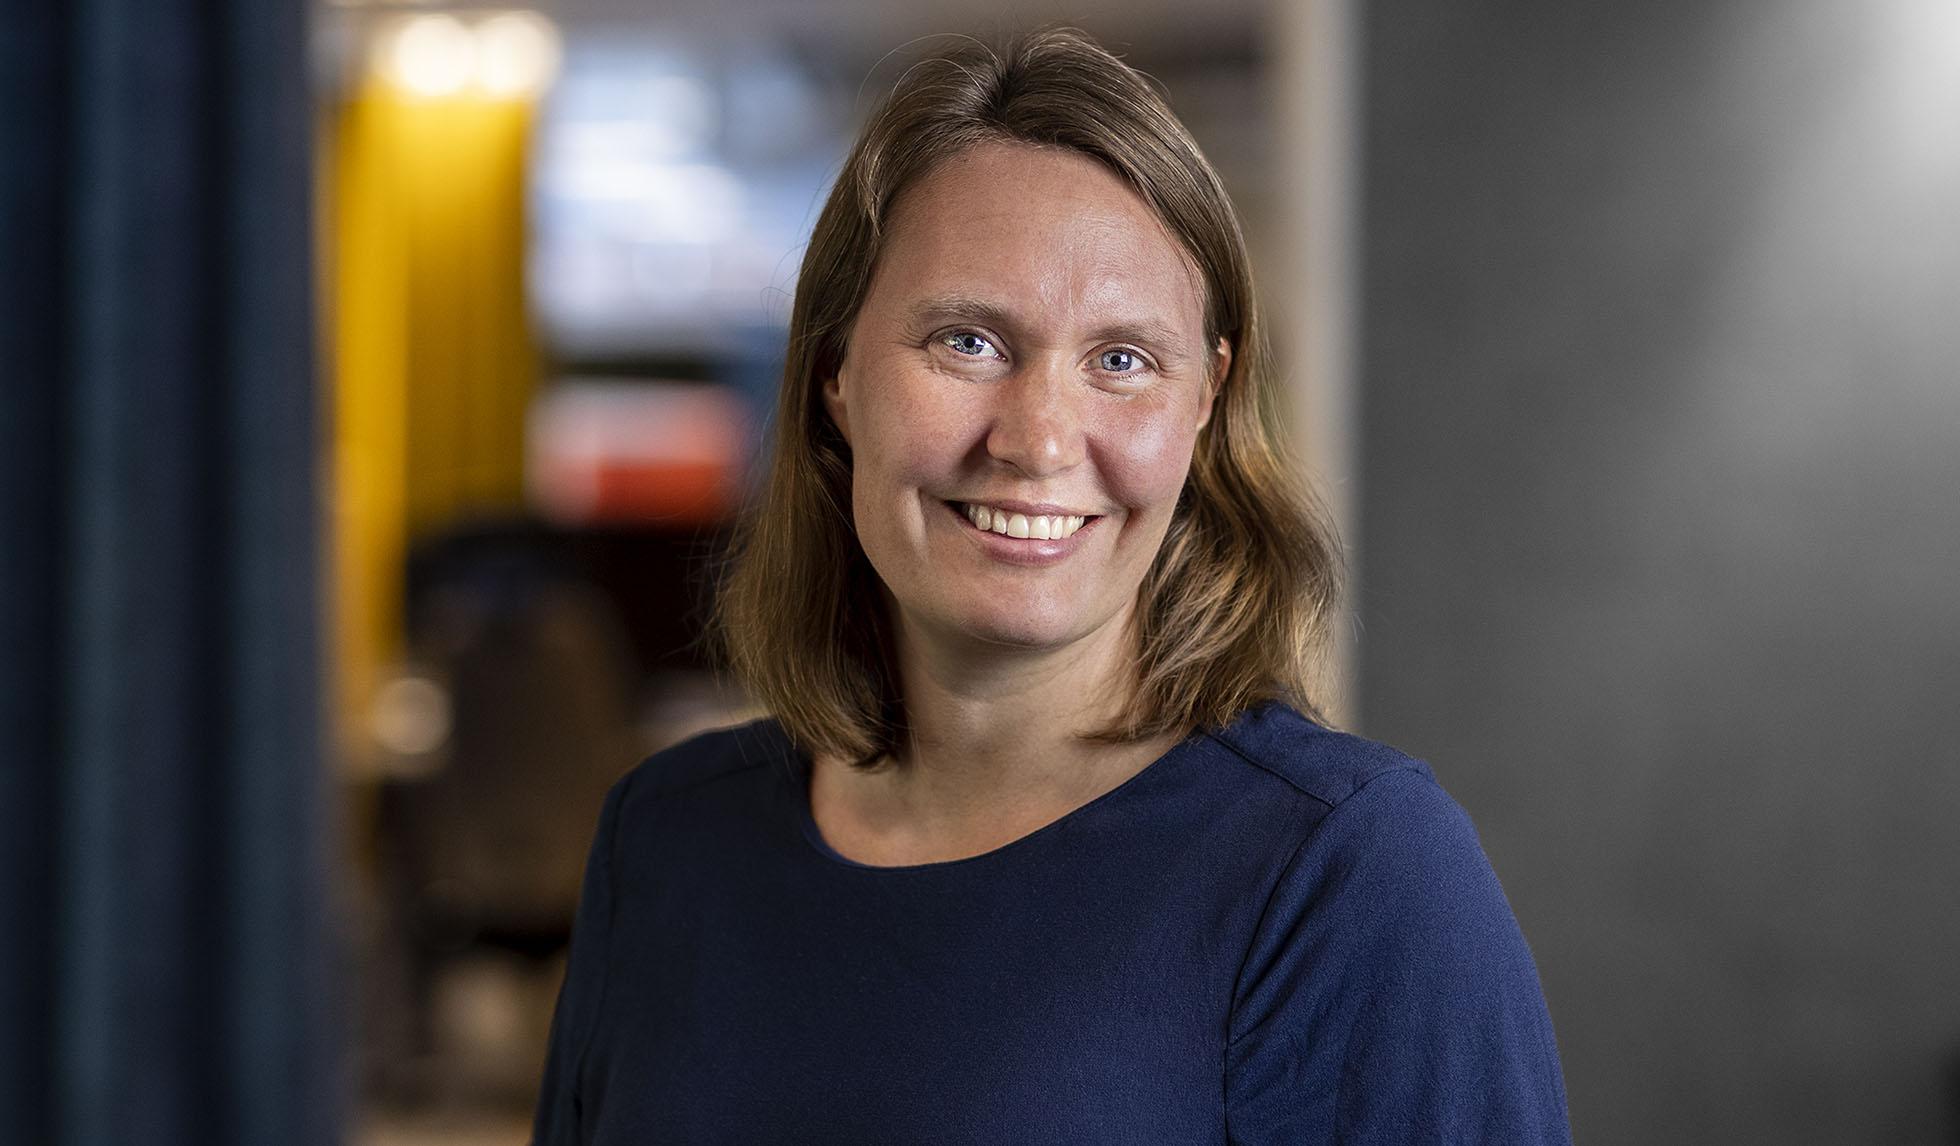 Tatiana Sderstrm, 55 r i Fllfors p - satisfaction-survey.net